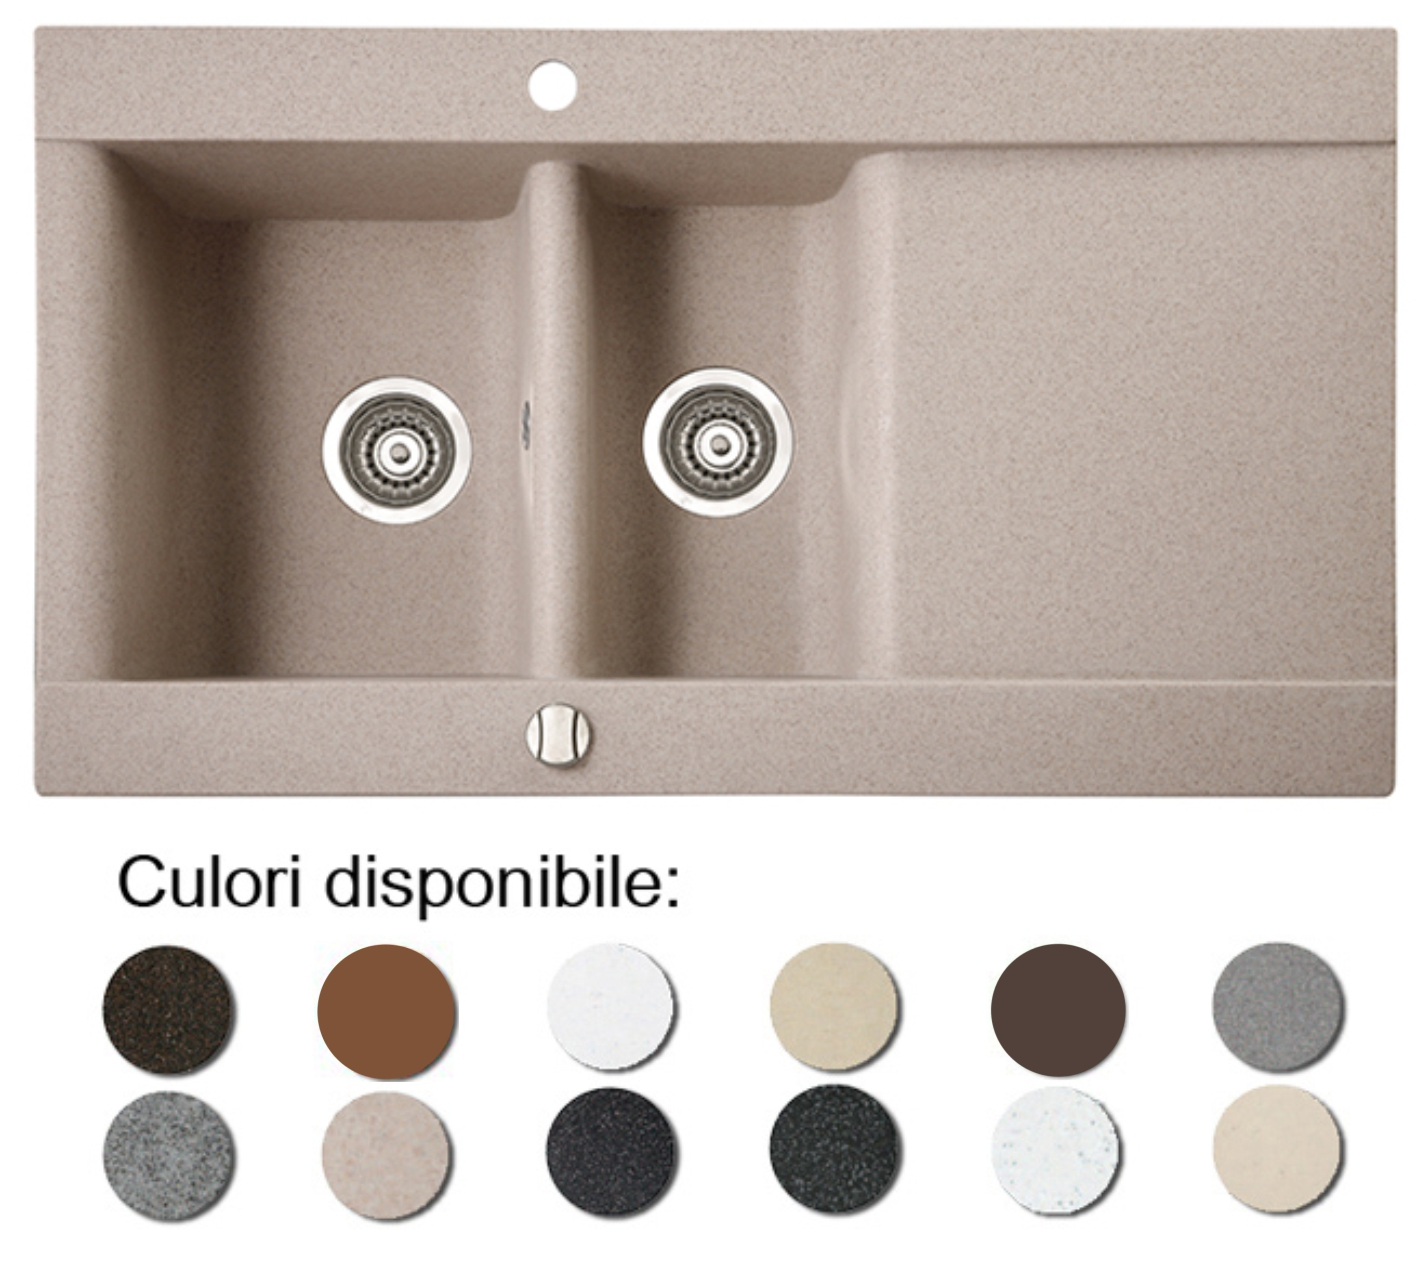 Chiuveta Bucatarie Granit Compozit Anticalcar Cuve Picurator Poza